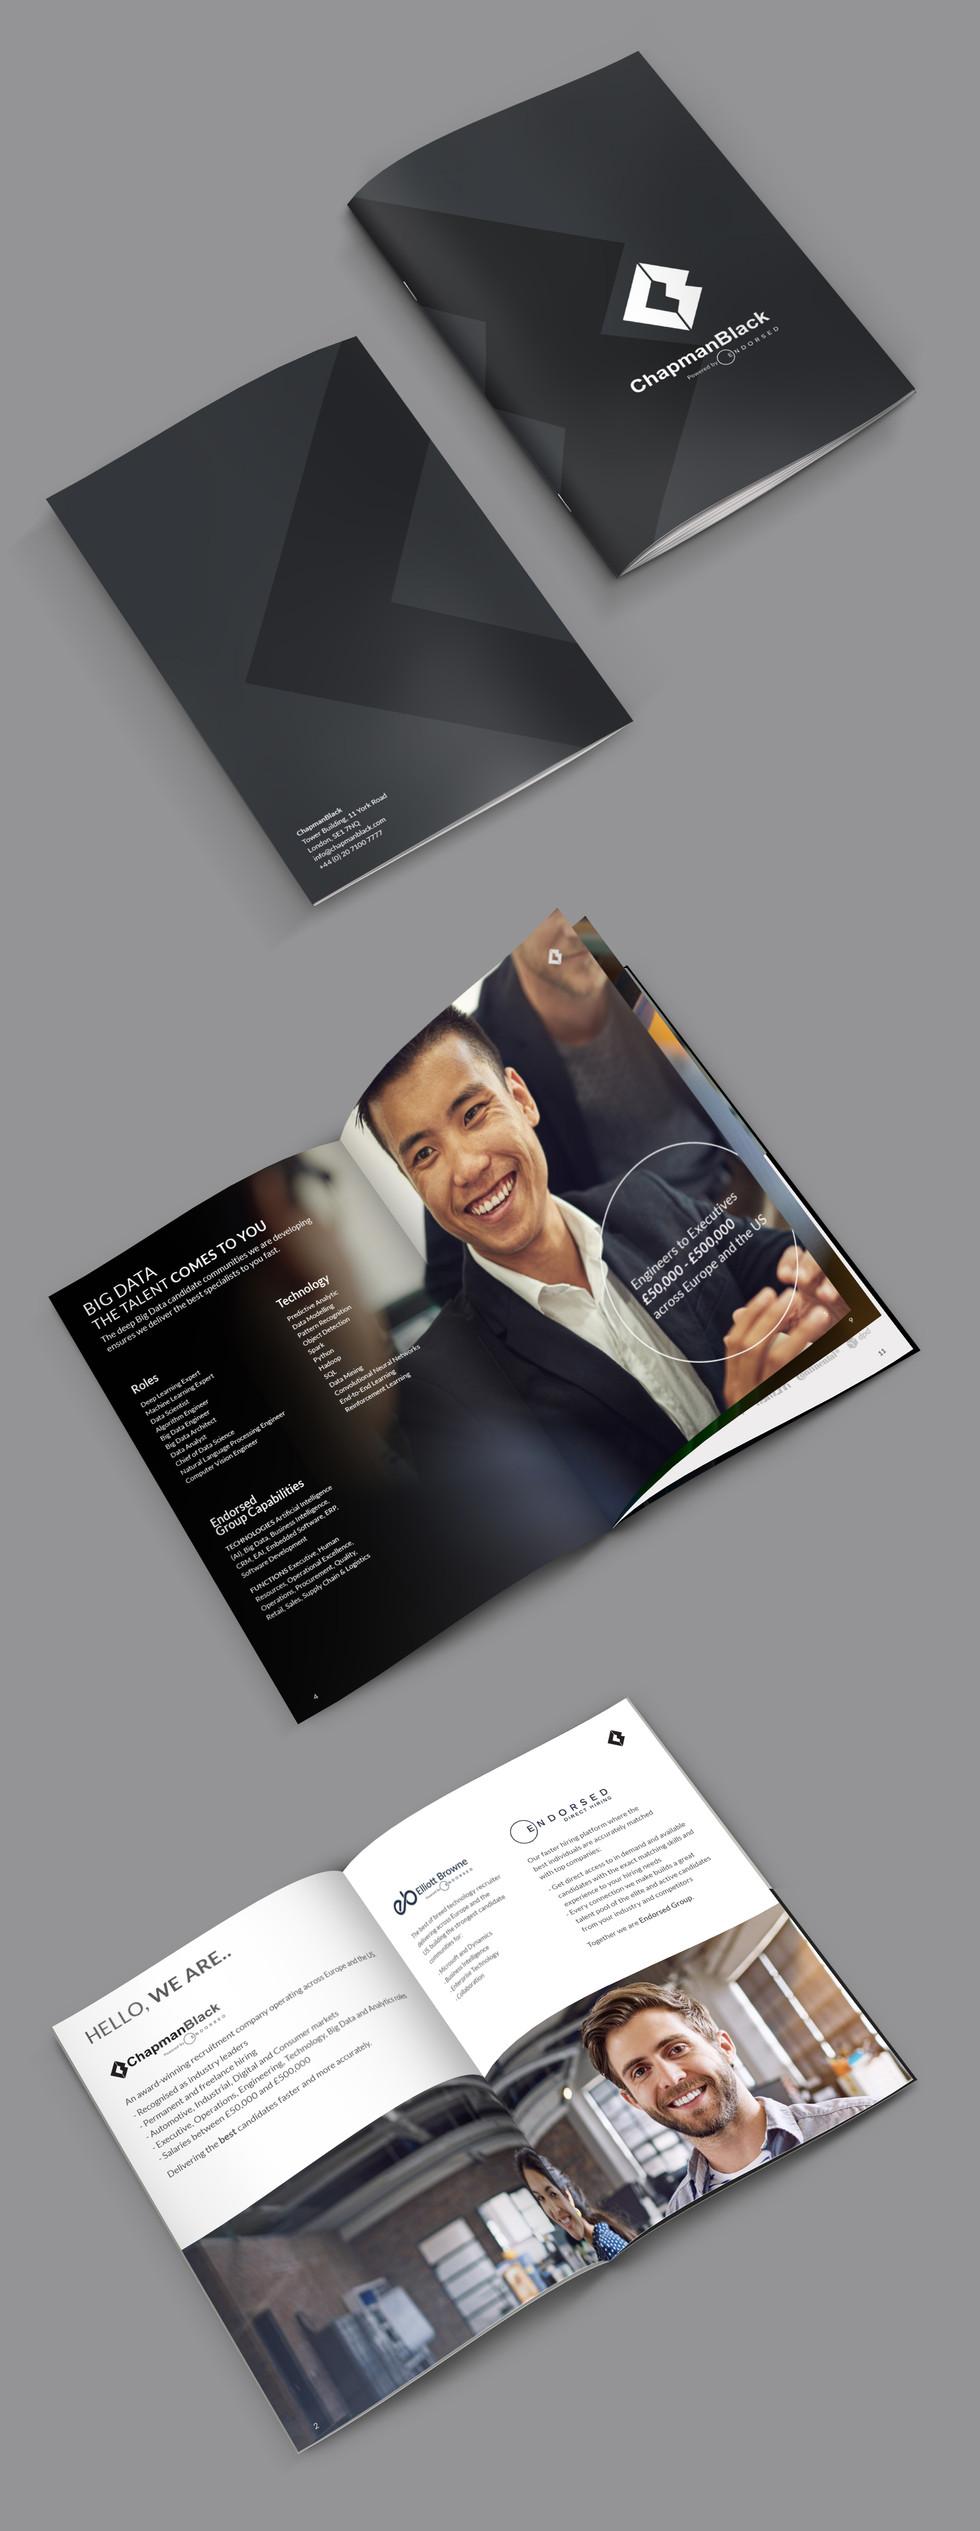 ChapmanBlack Brochure Layout Design Romi Nicole Schneider